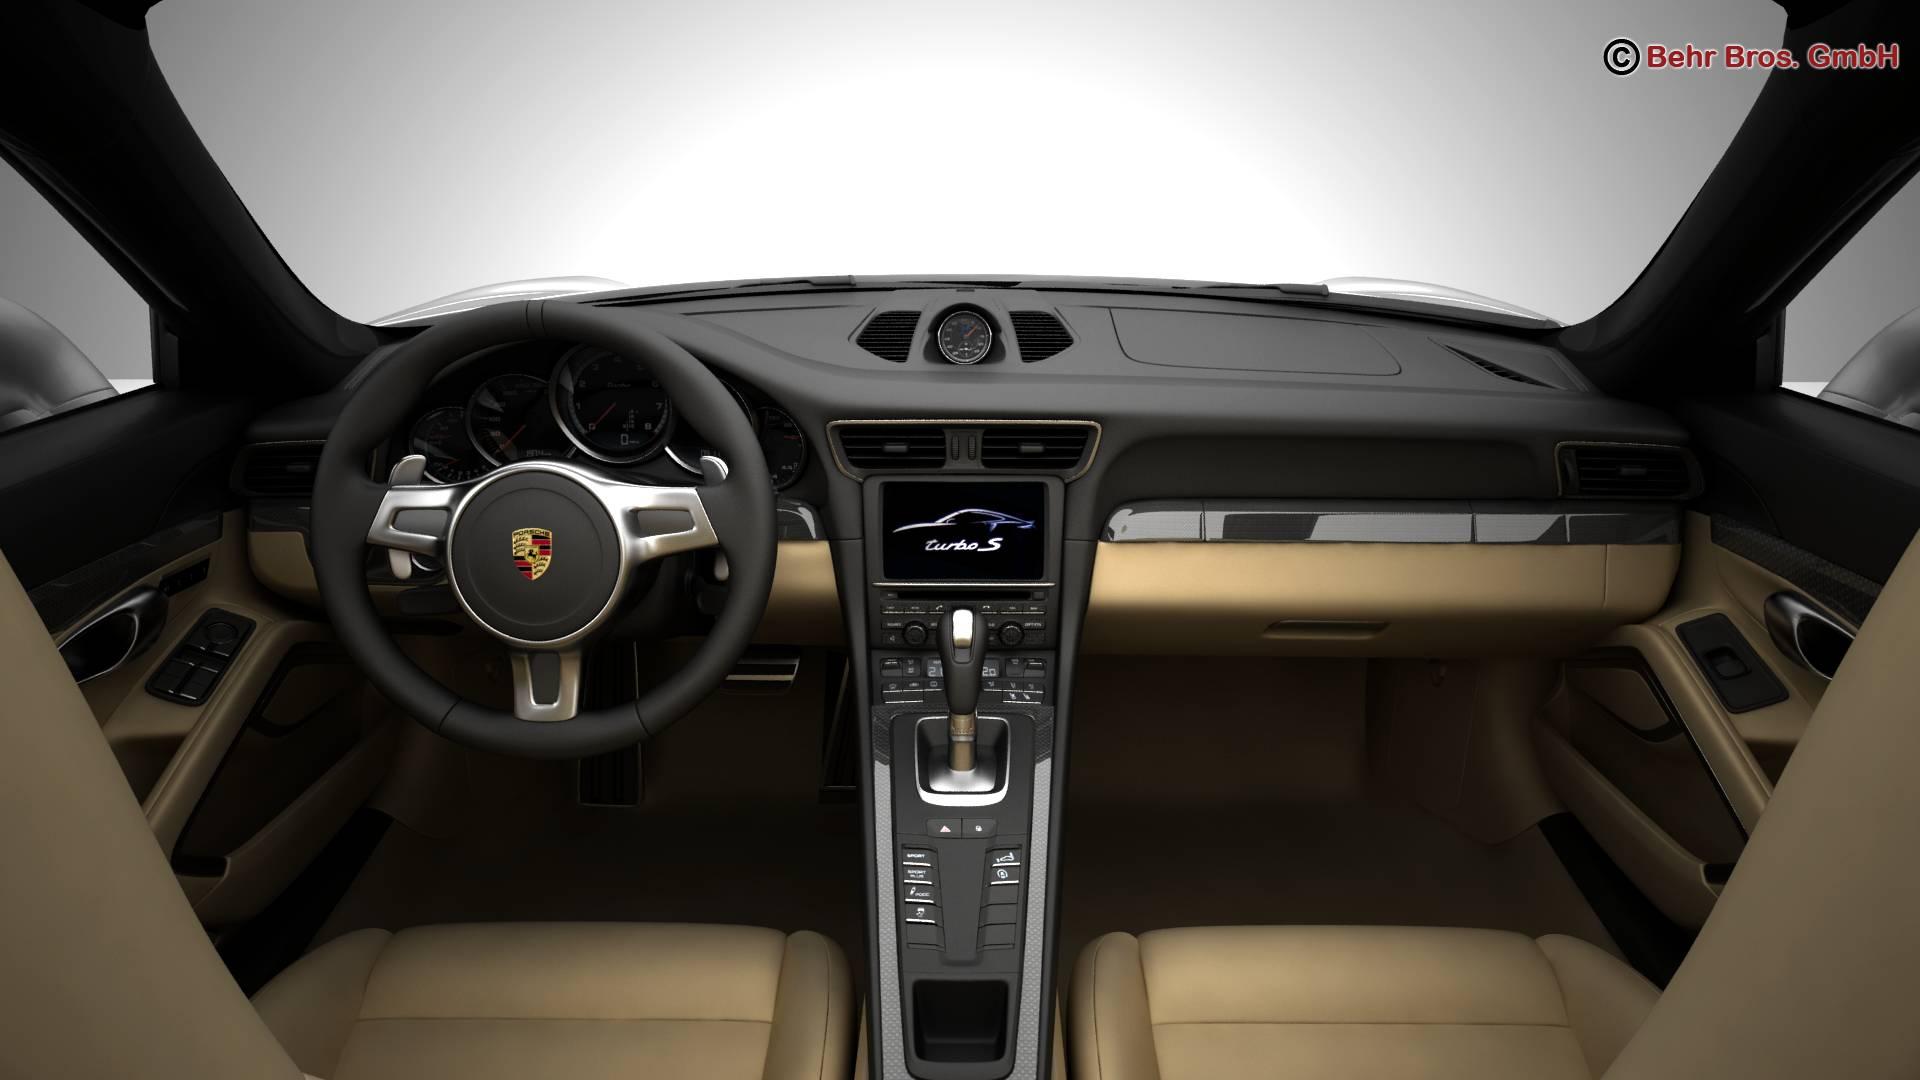 porsche 911 turbo s 2014 3d model 3ds max fbx c4d lwo ma mb obj 212488